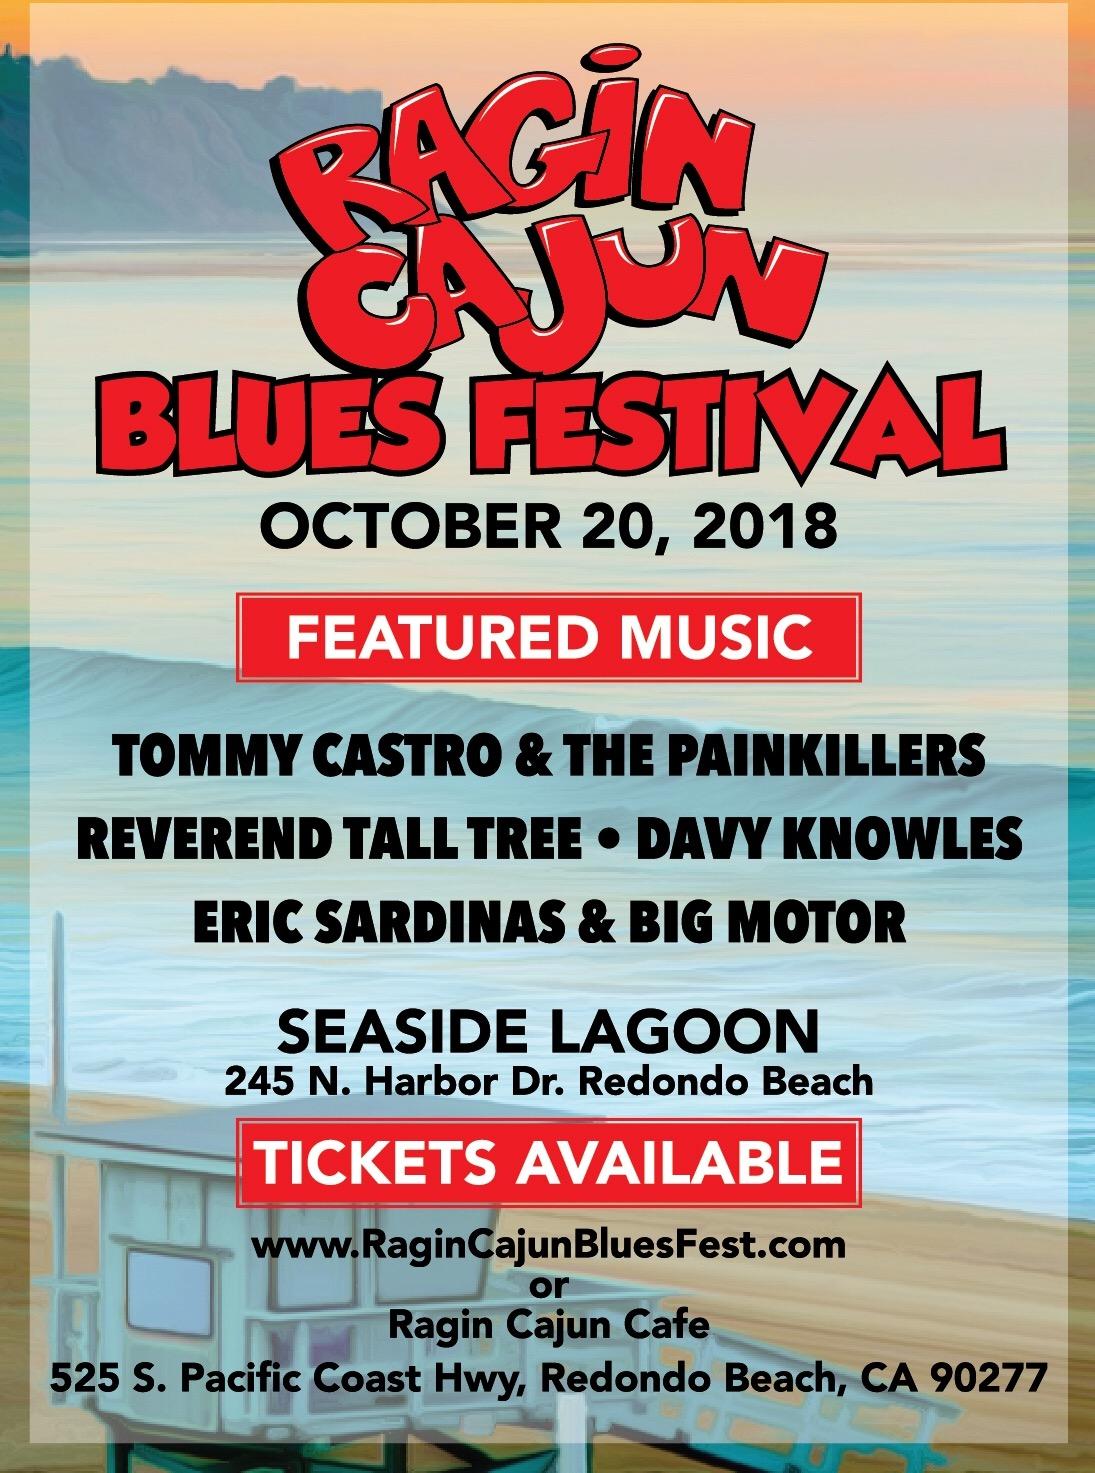 Ragin Cajun Blues Festival @ Seaside Lagoon | Redondo Beach | California | United States